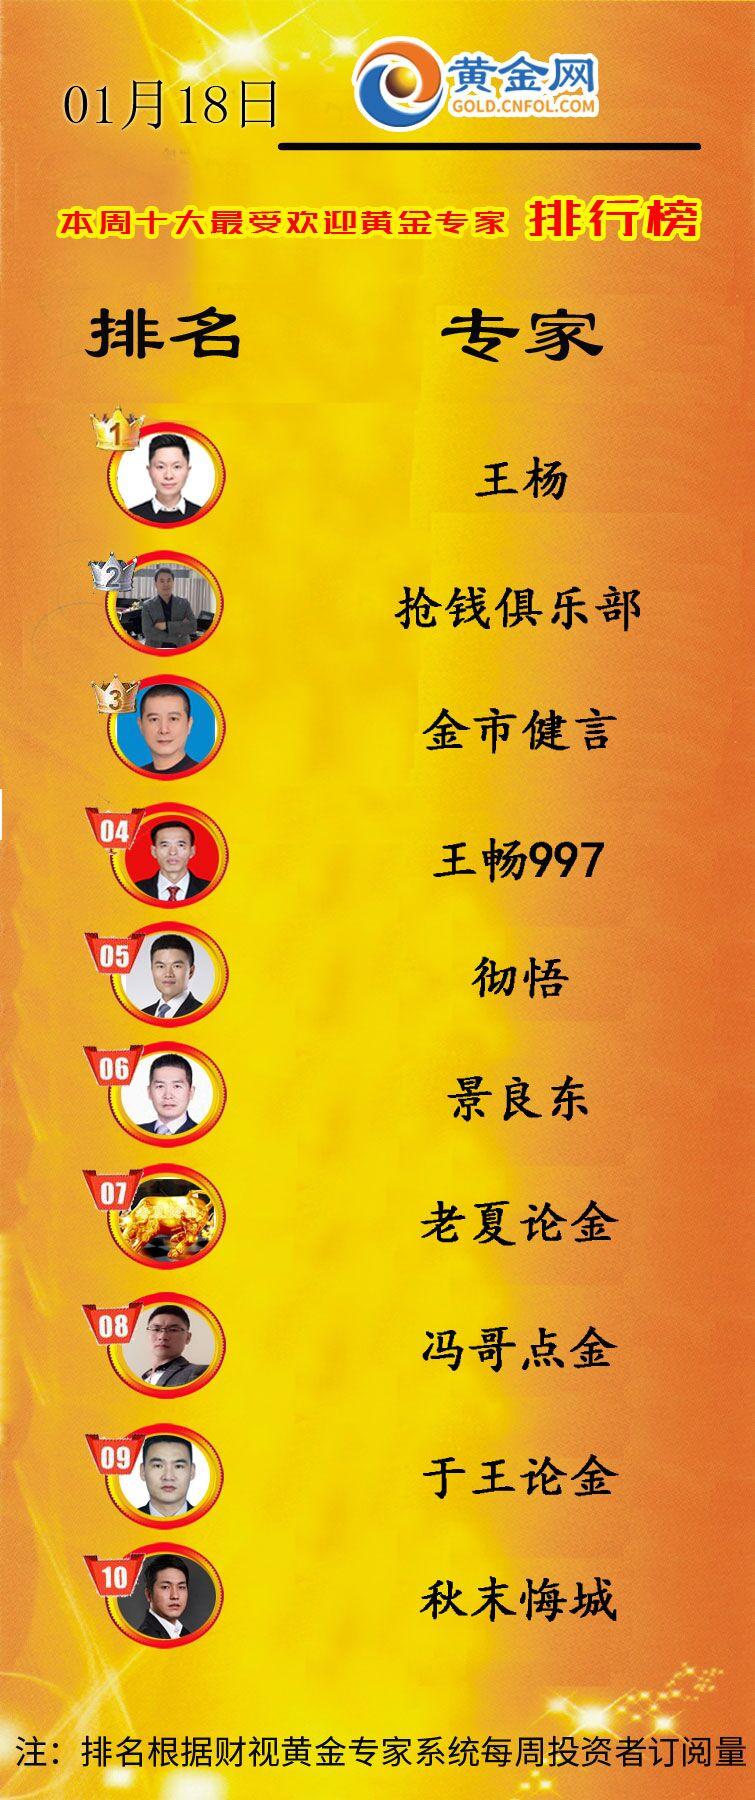 http://gold.cnfol.com/mingjiadianjin/20190119/27198953.shtml